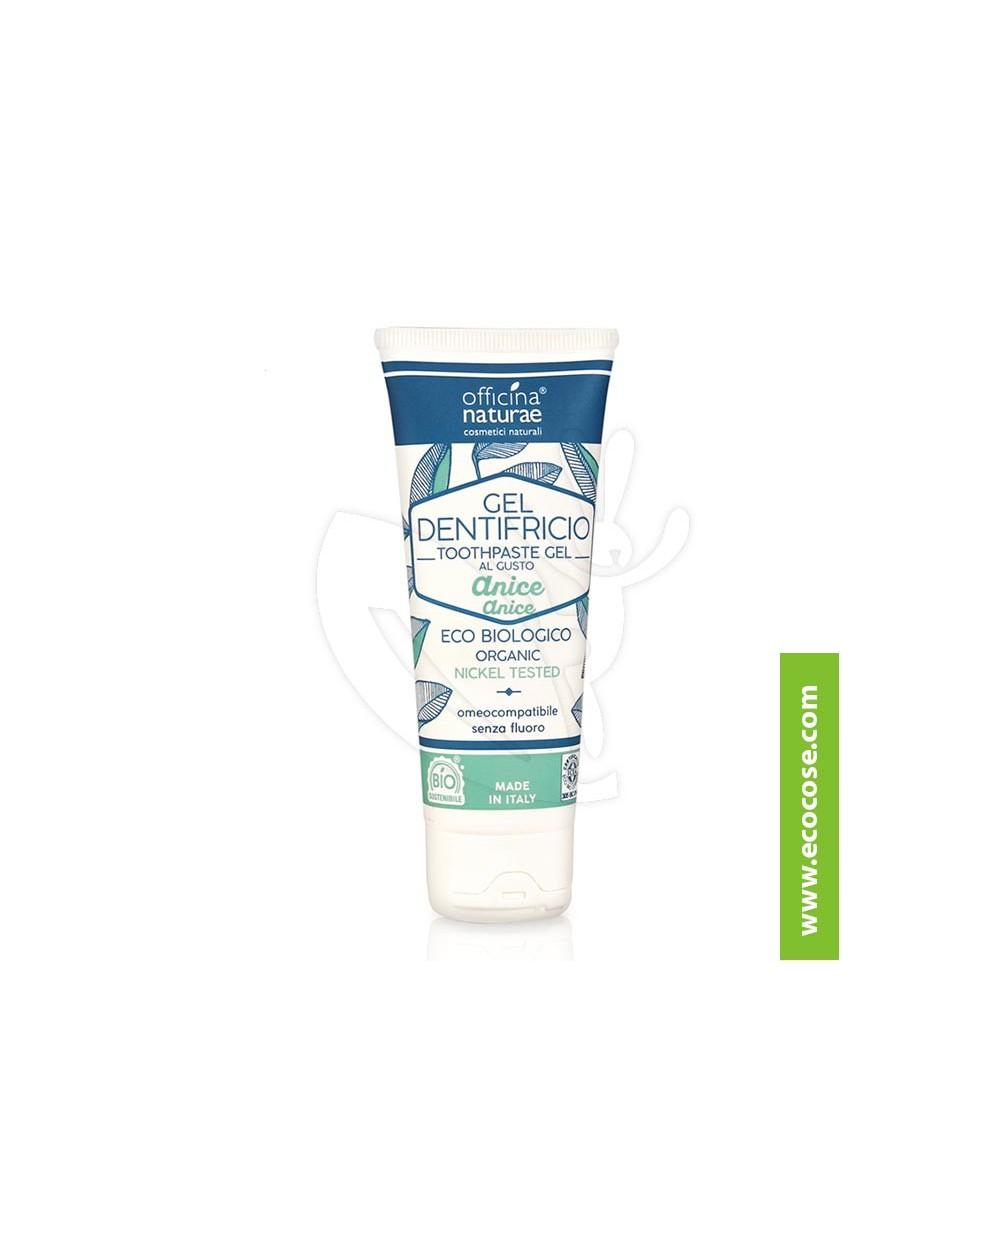 Officina Naturae - Gel dentifricio naturale ANICE